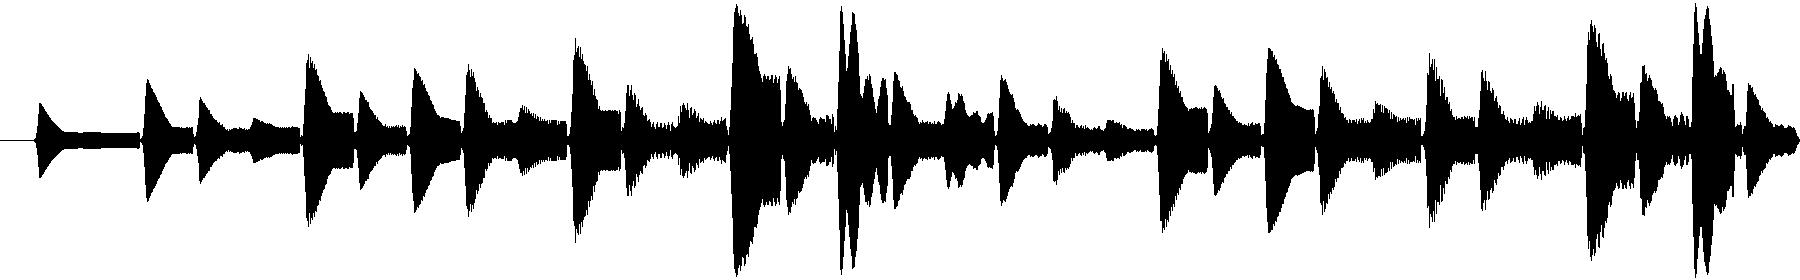 innocent synth loop 1